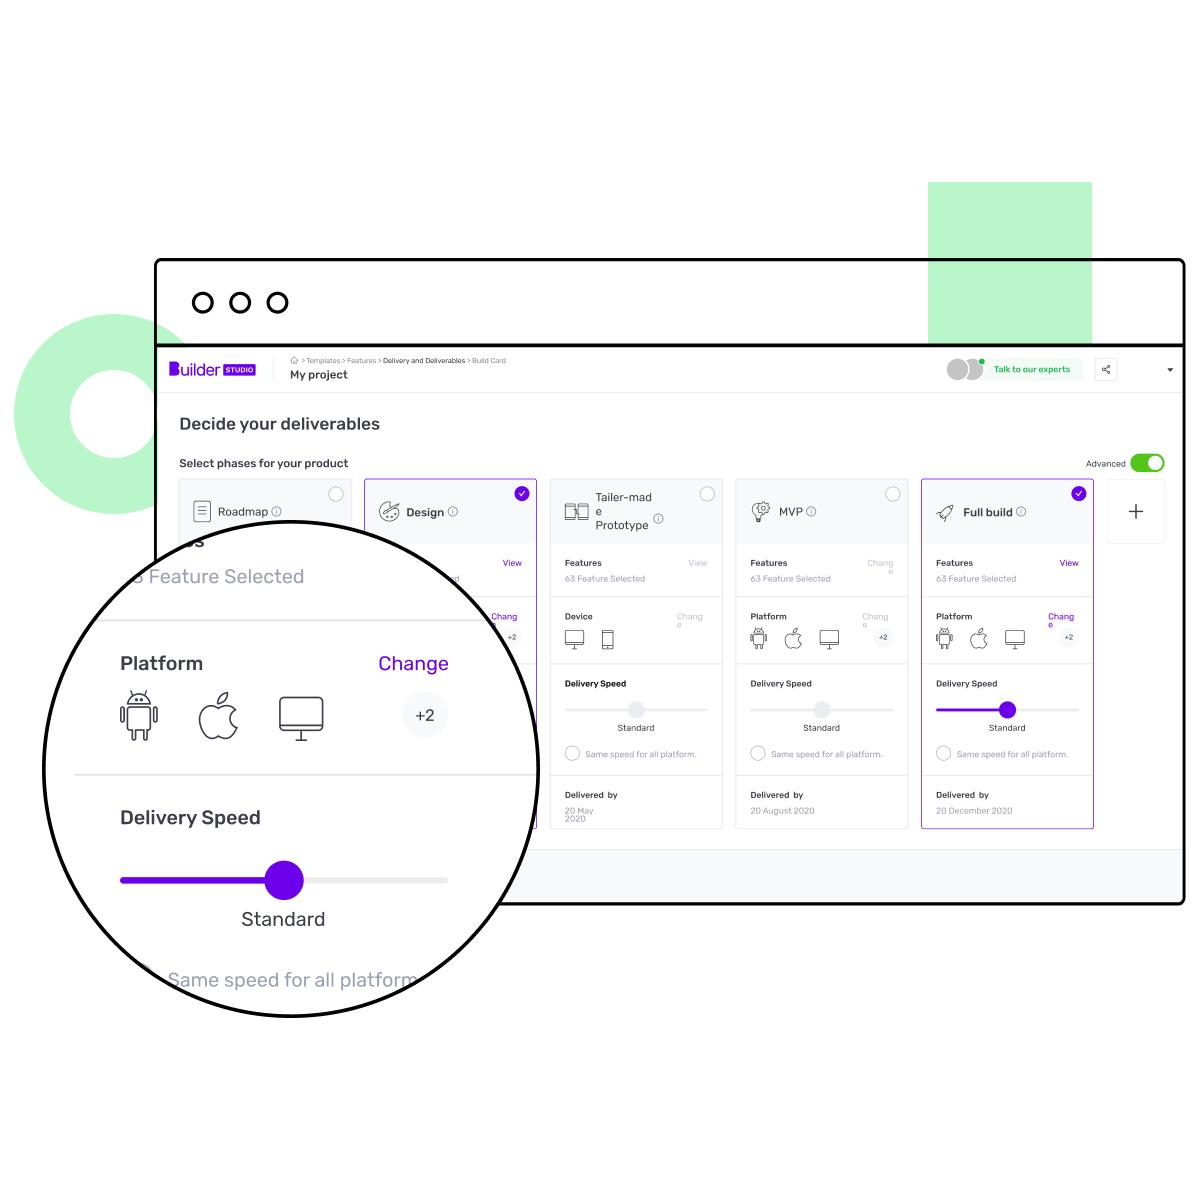 Builder Care dashboard screen with software development platforms